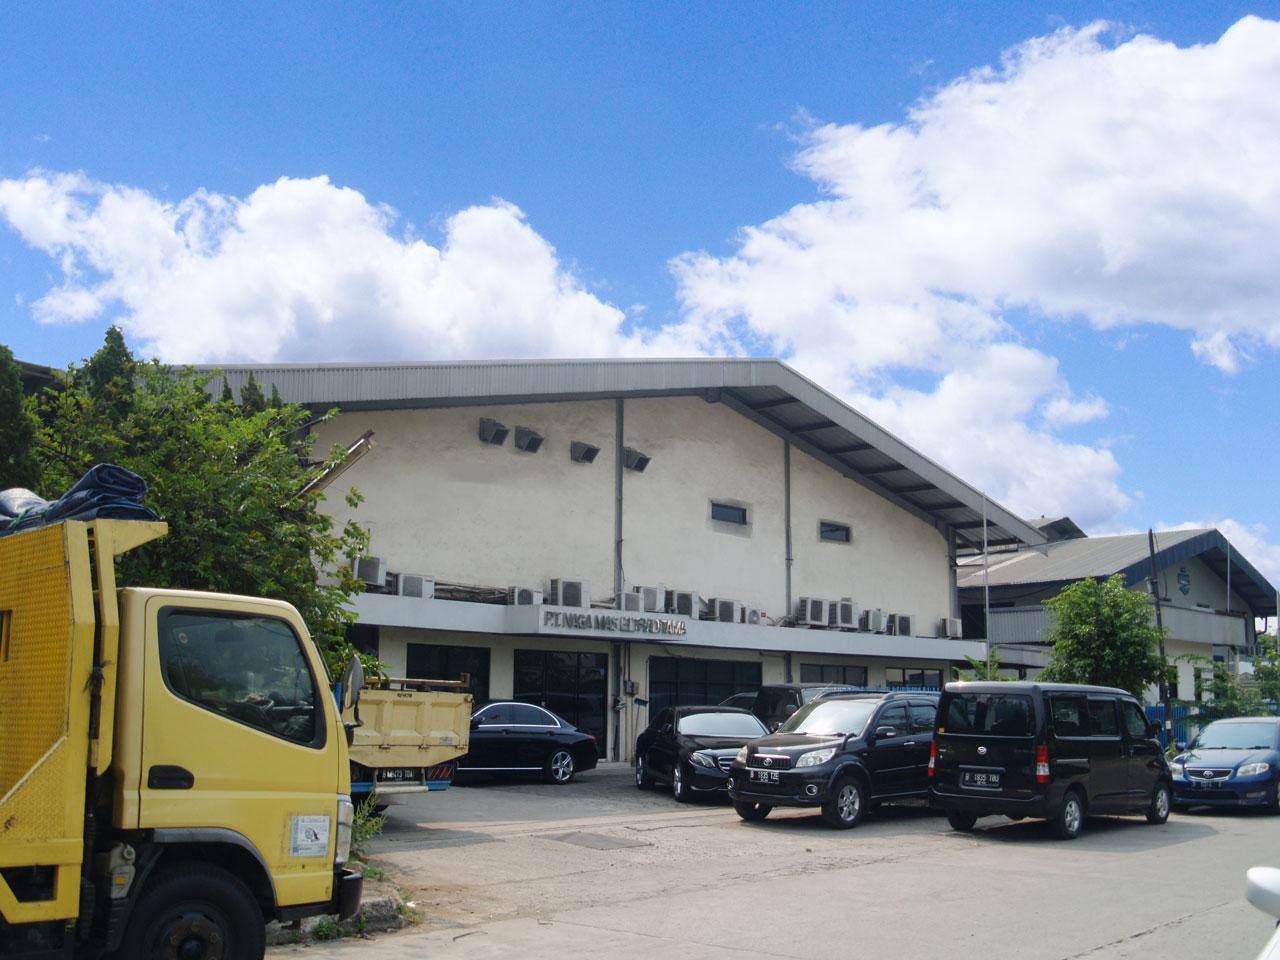 PT Naga Maseltraditama Office